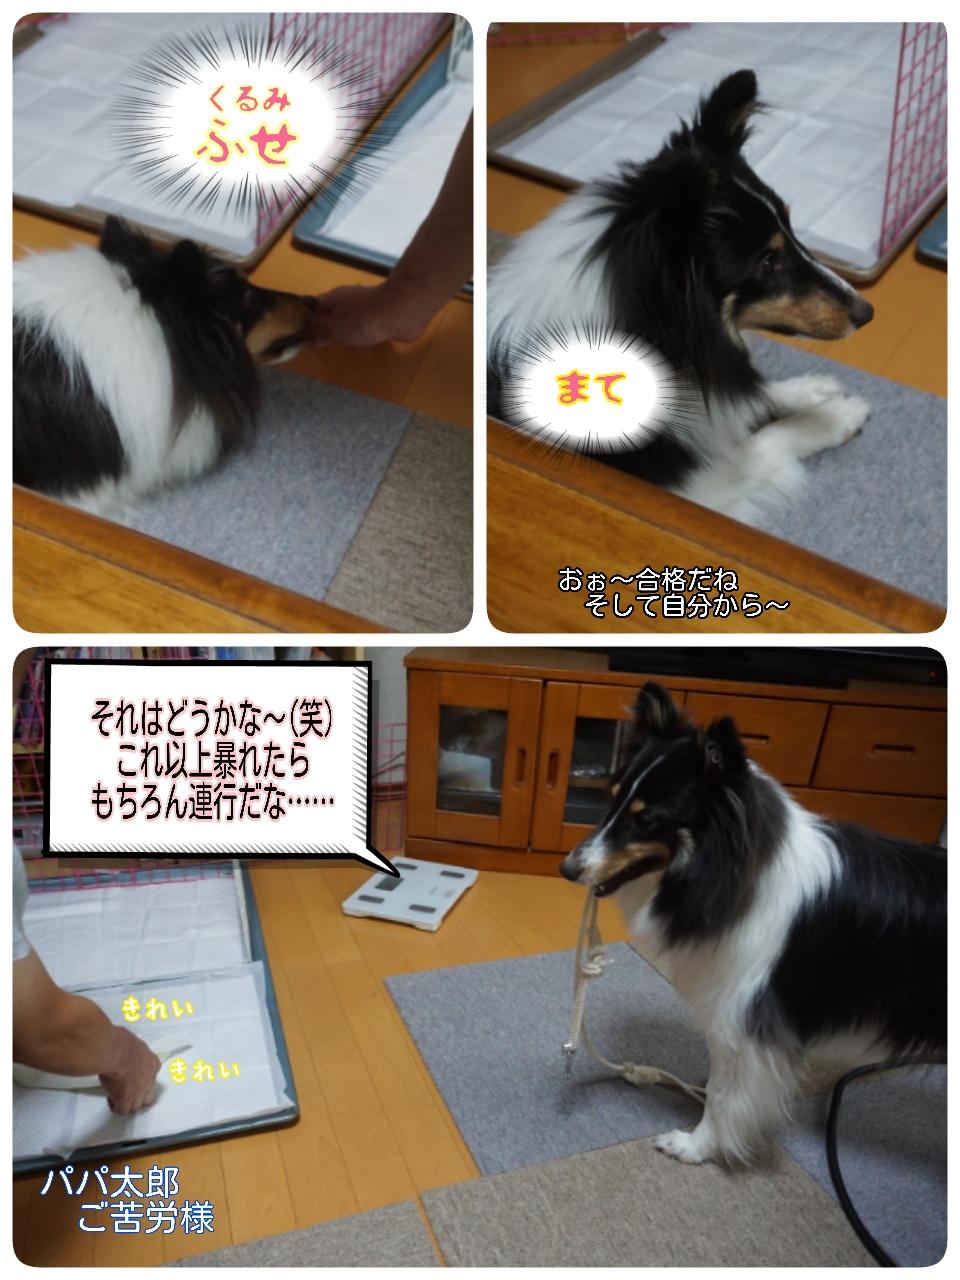 16-07-09-15-31-37-281_deco.jpg